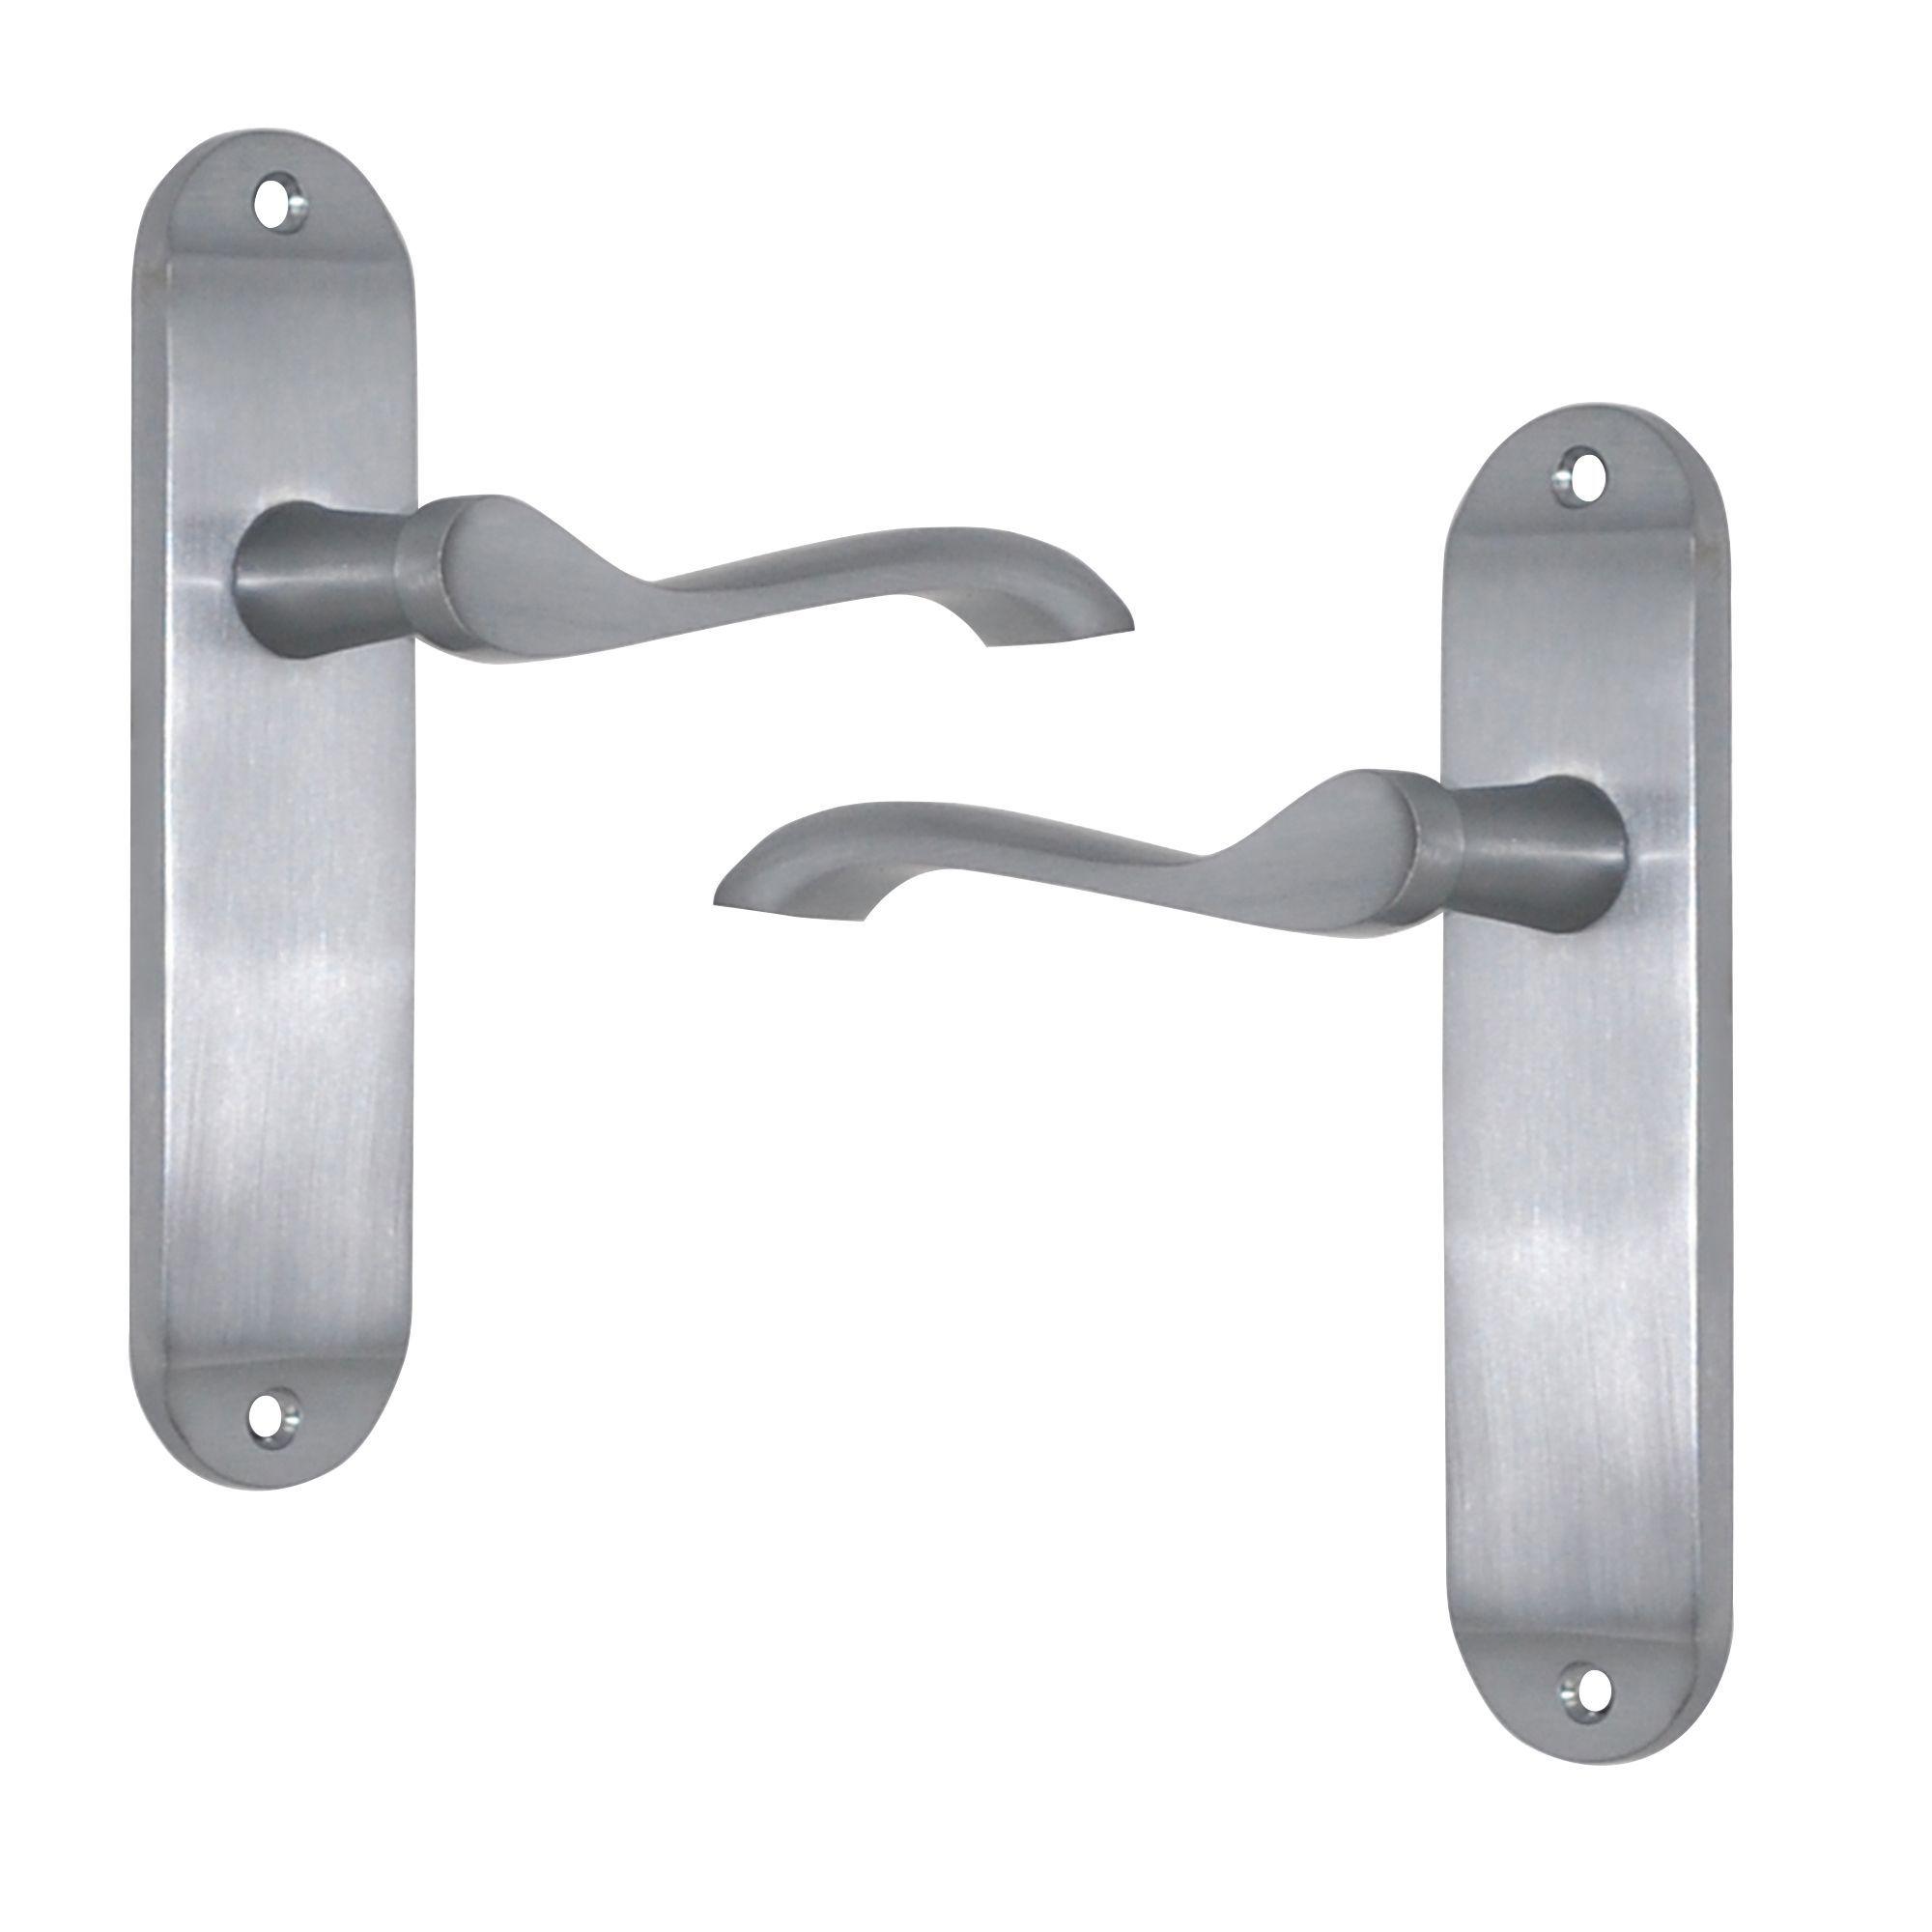 Satin Chrome Effect Internal Scroll Latch Door Handle 1